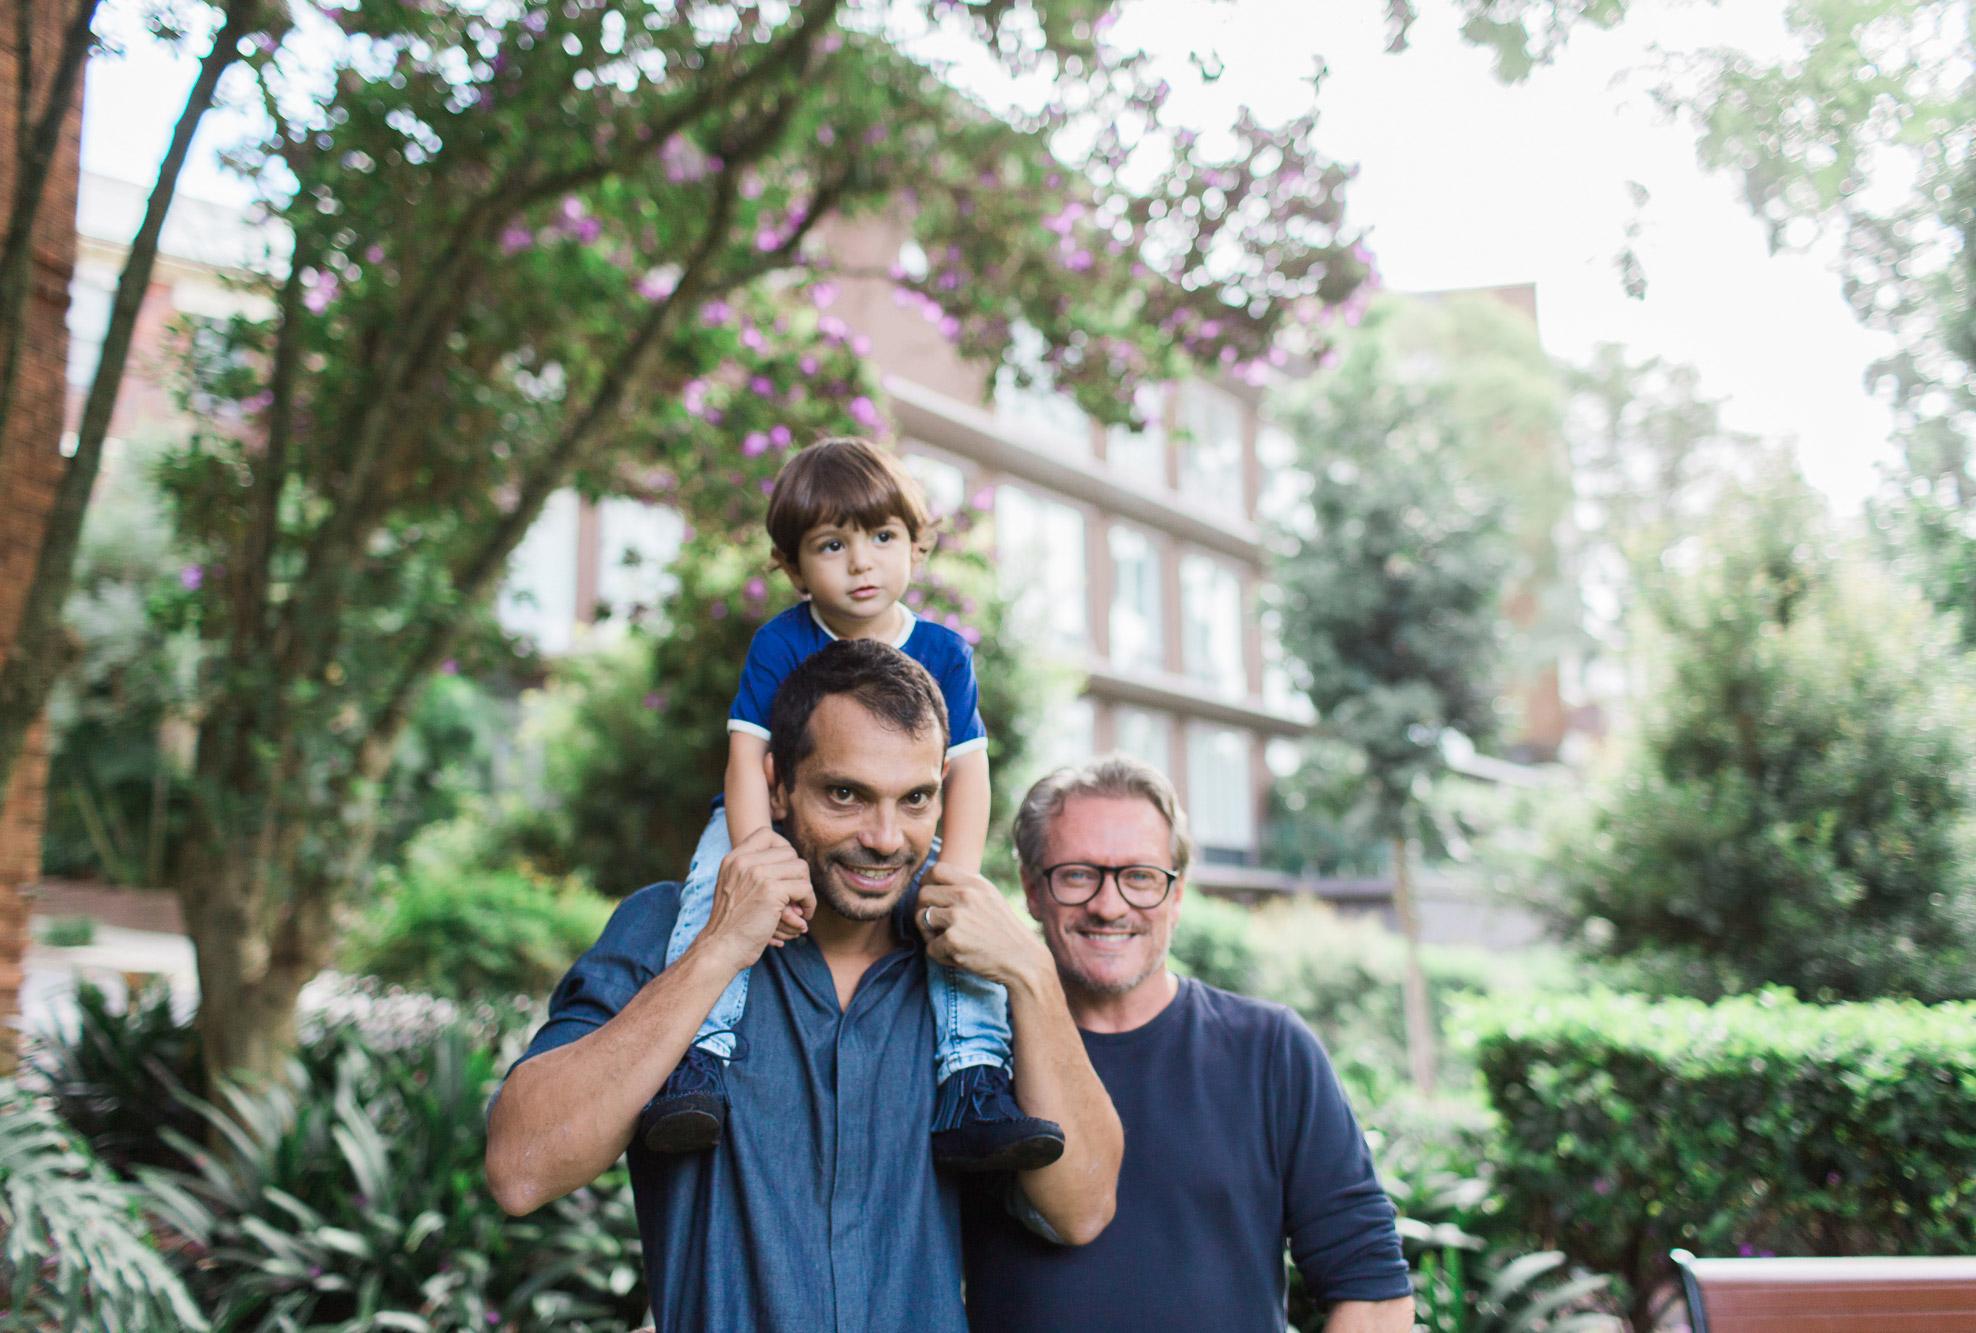 Jayson Brunsdon & Aaron Elias on surrogacy, fashion and fatherhood